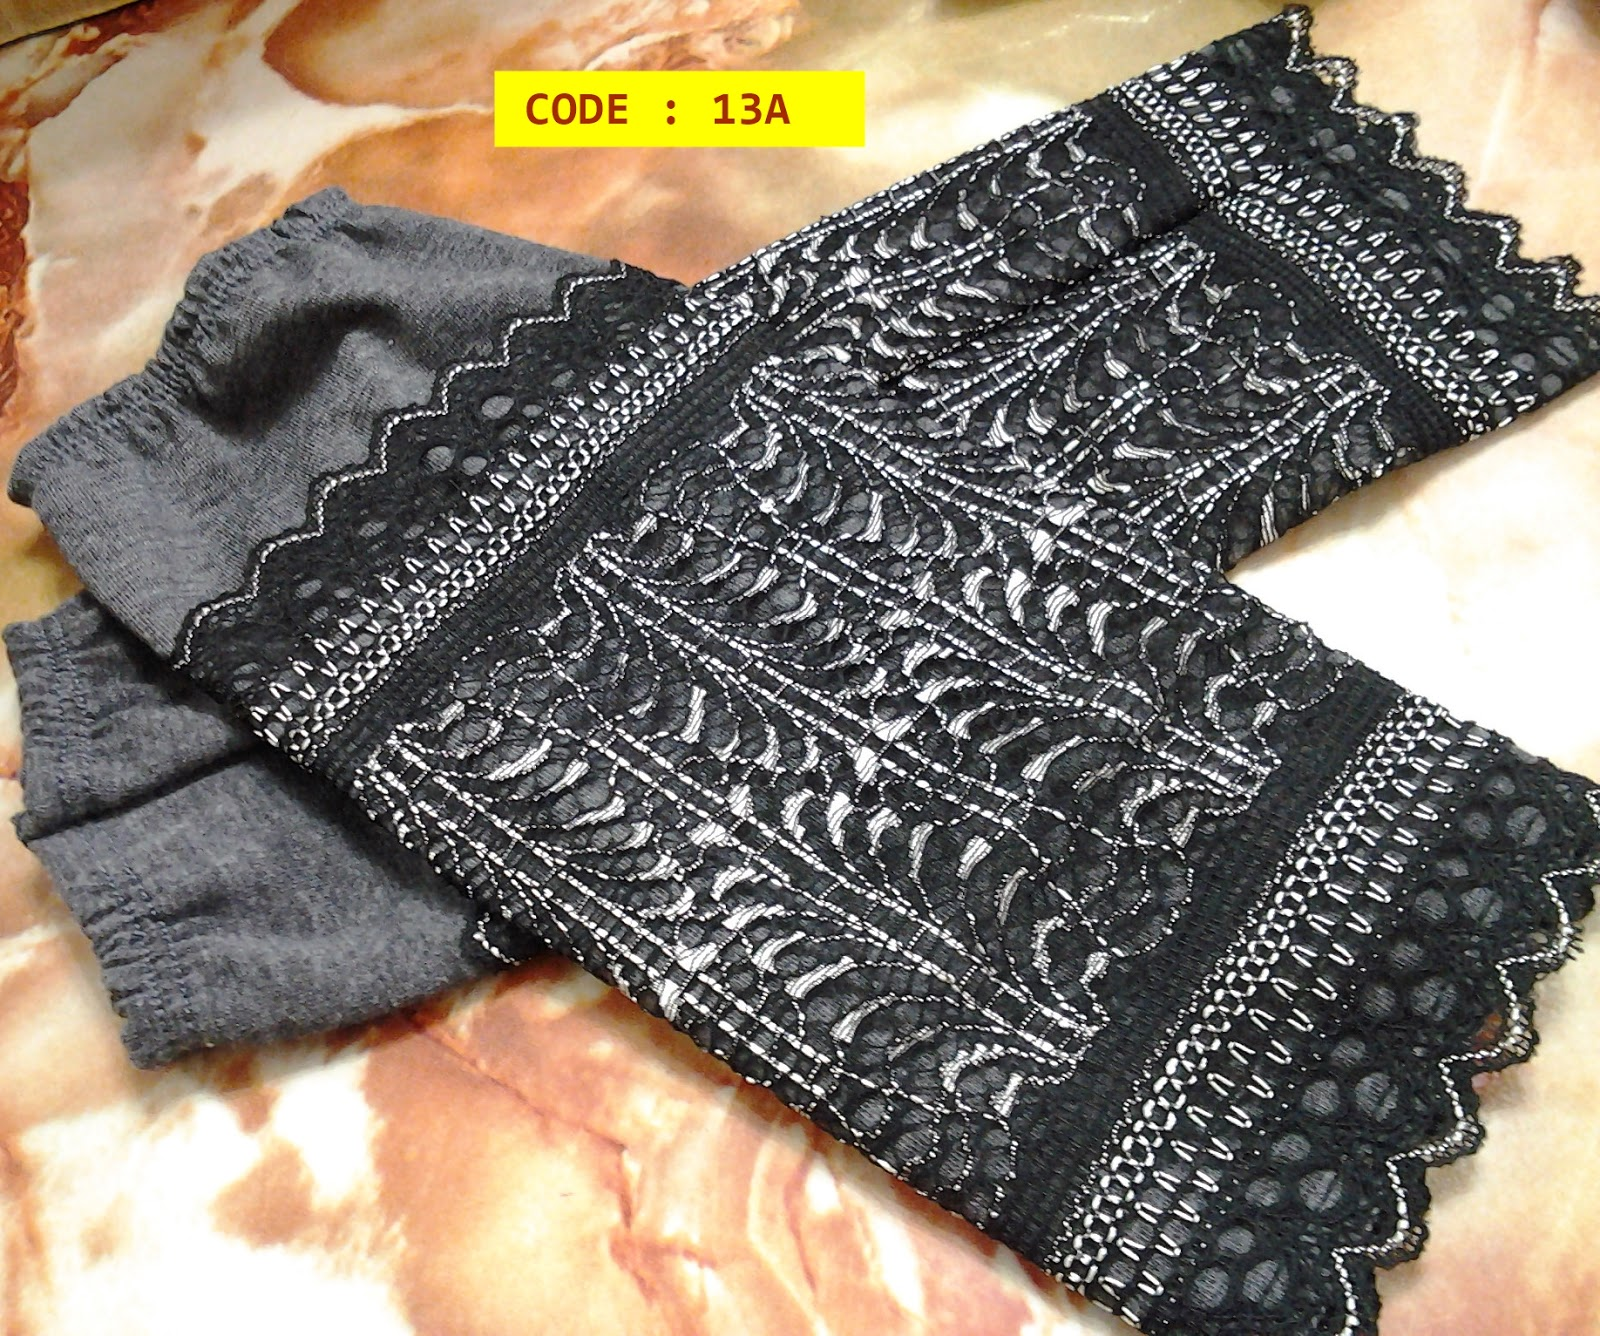 http://aenarasa.blogspot.com/2014/05/handsock-lacey-cotton-bukan-sekadar.html